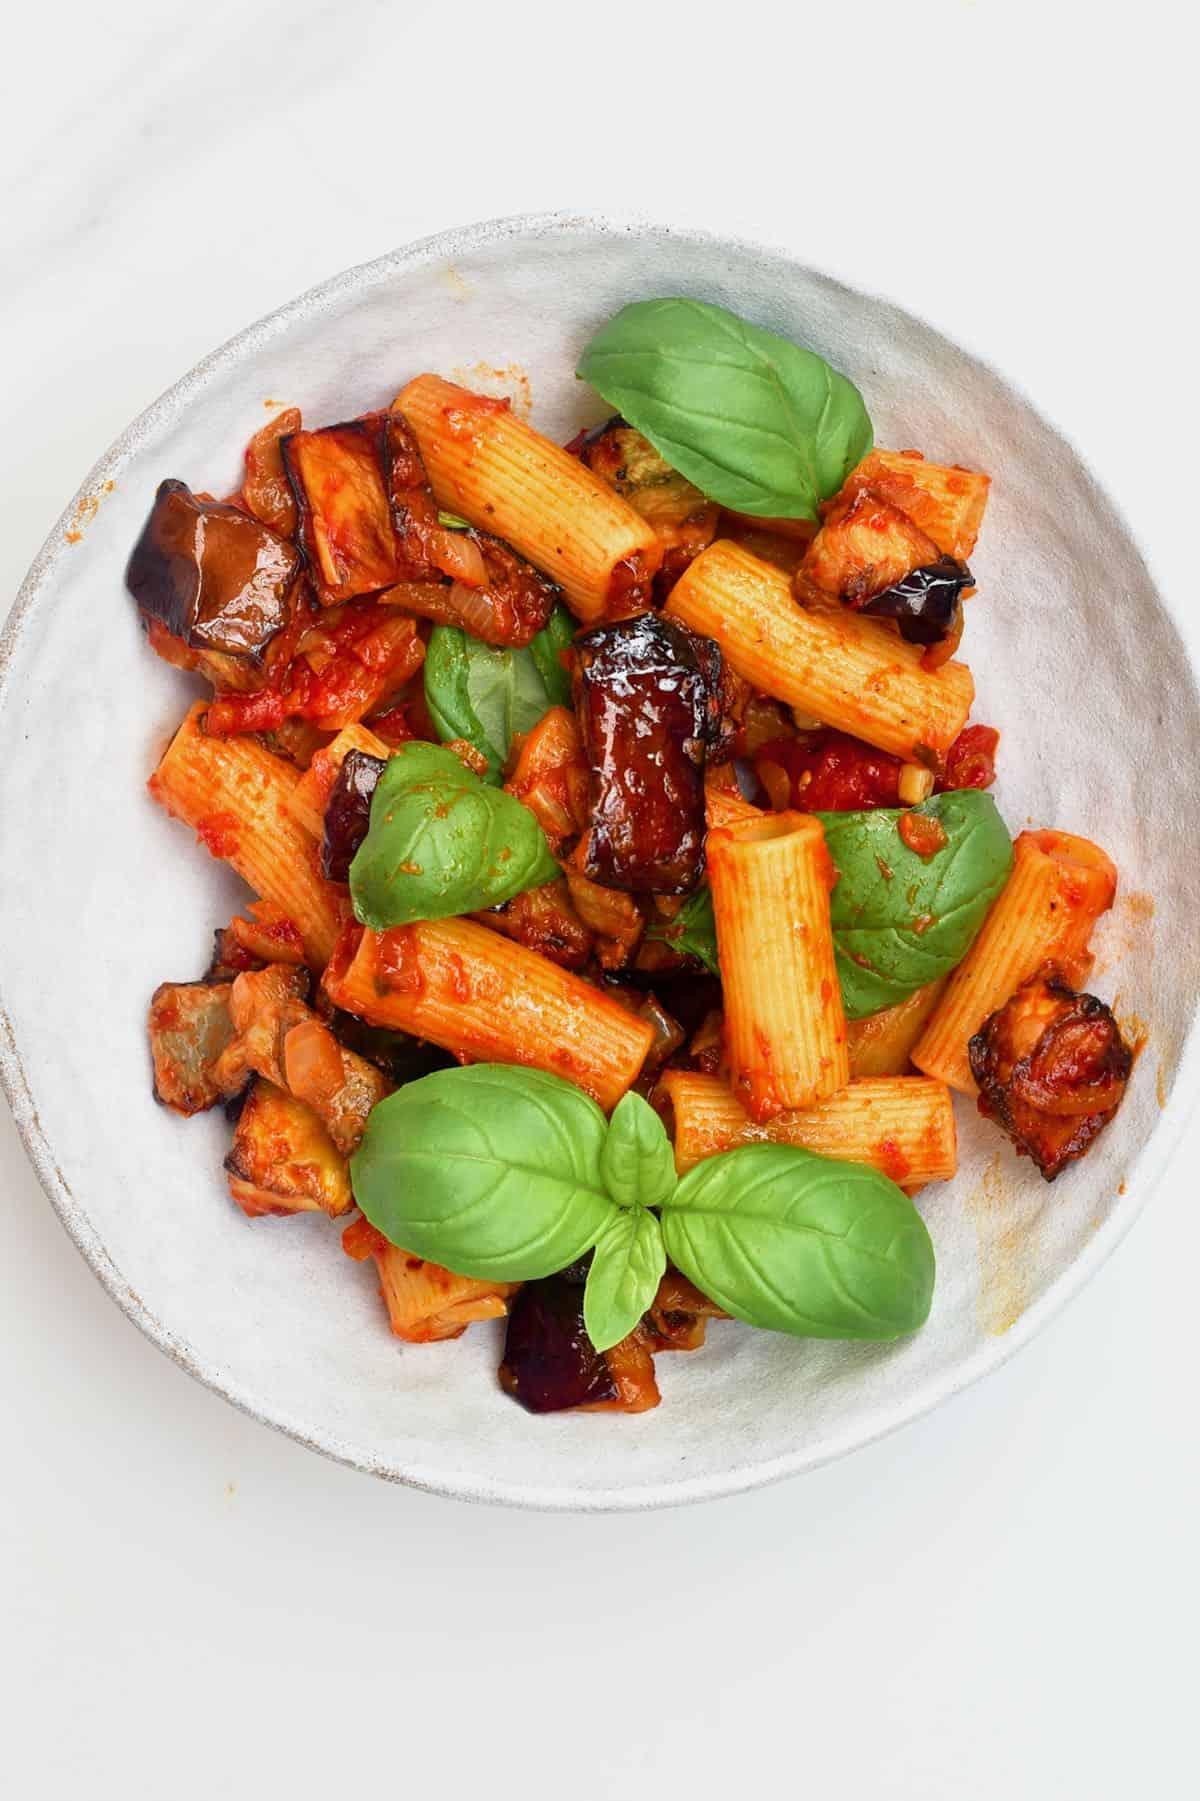 A bowl with pasta alla norma